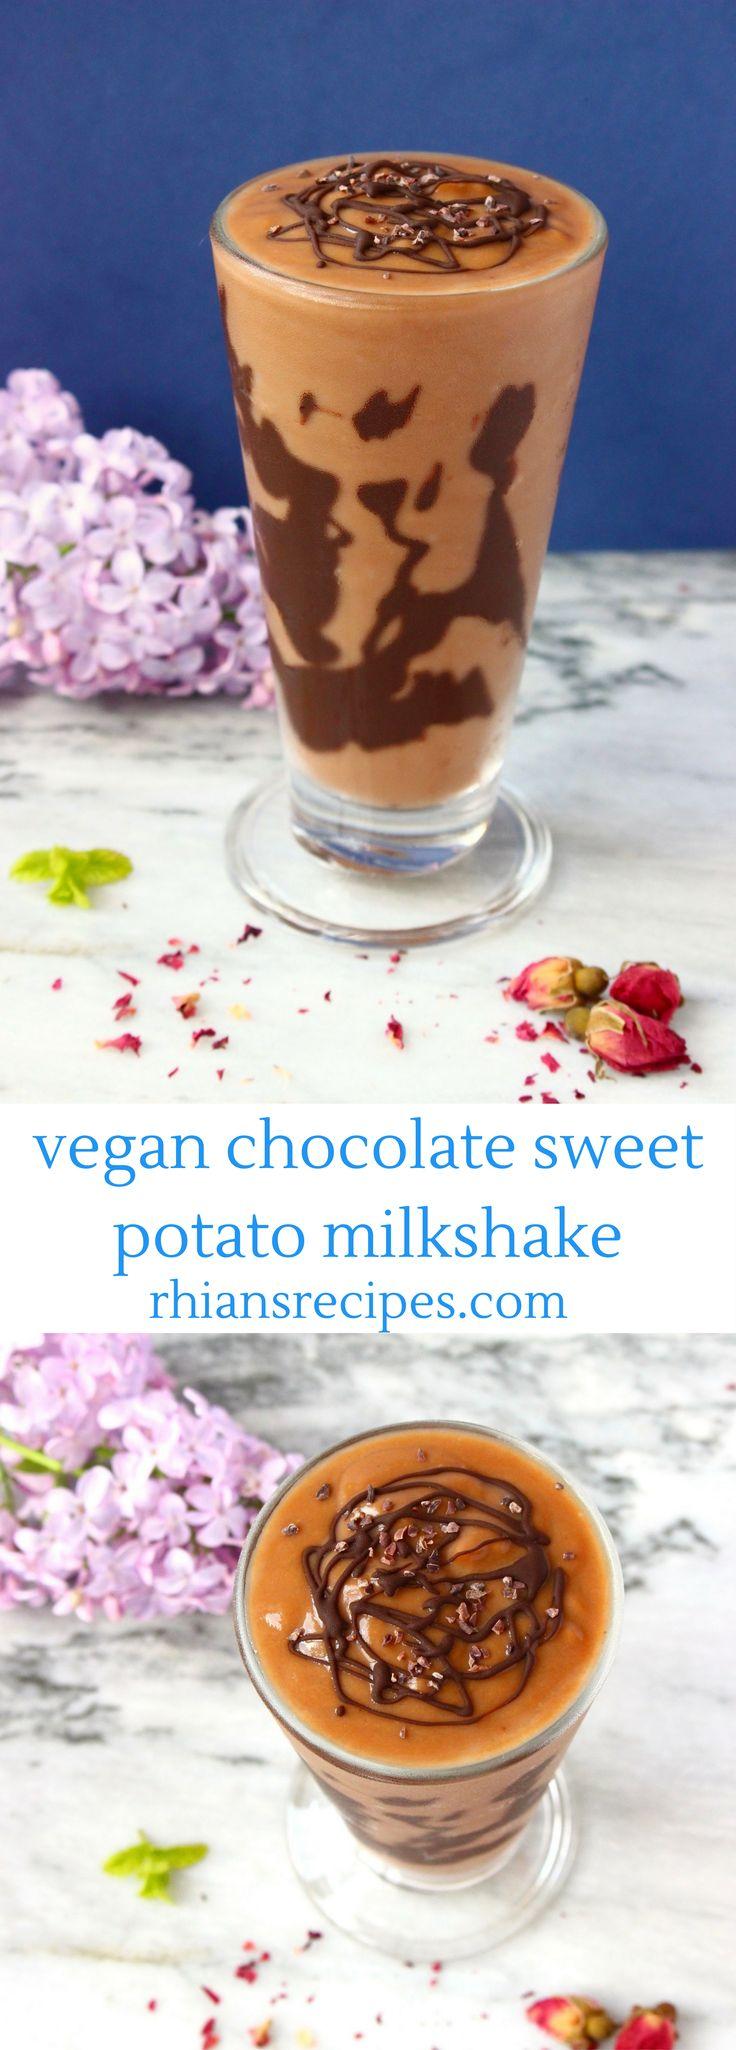 Chocolate Sweet Potato Milkshake - vegan, gluten-free and refined sugar free. 3 ingredients, easy to make, super healthy!